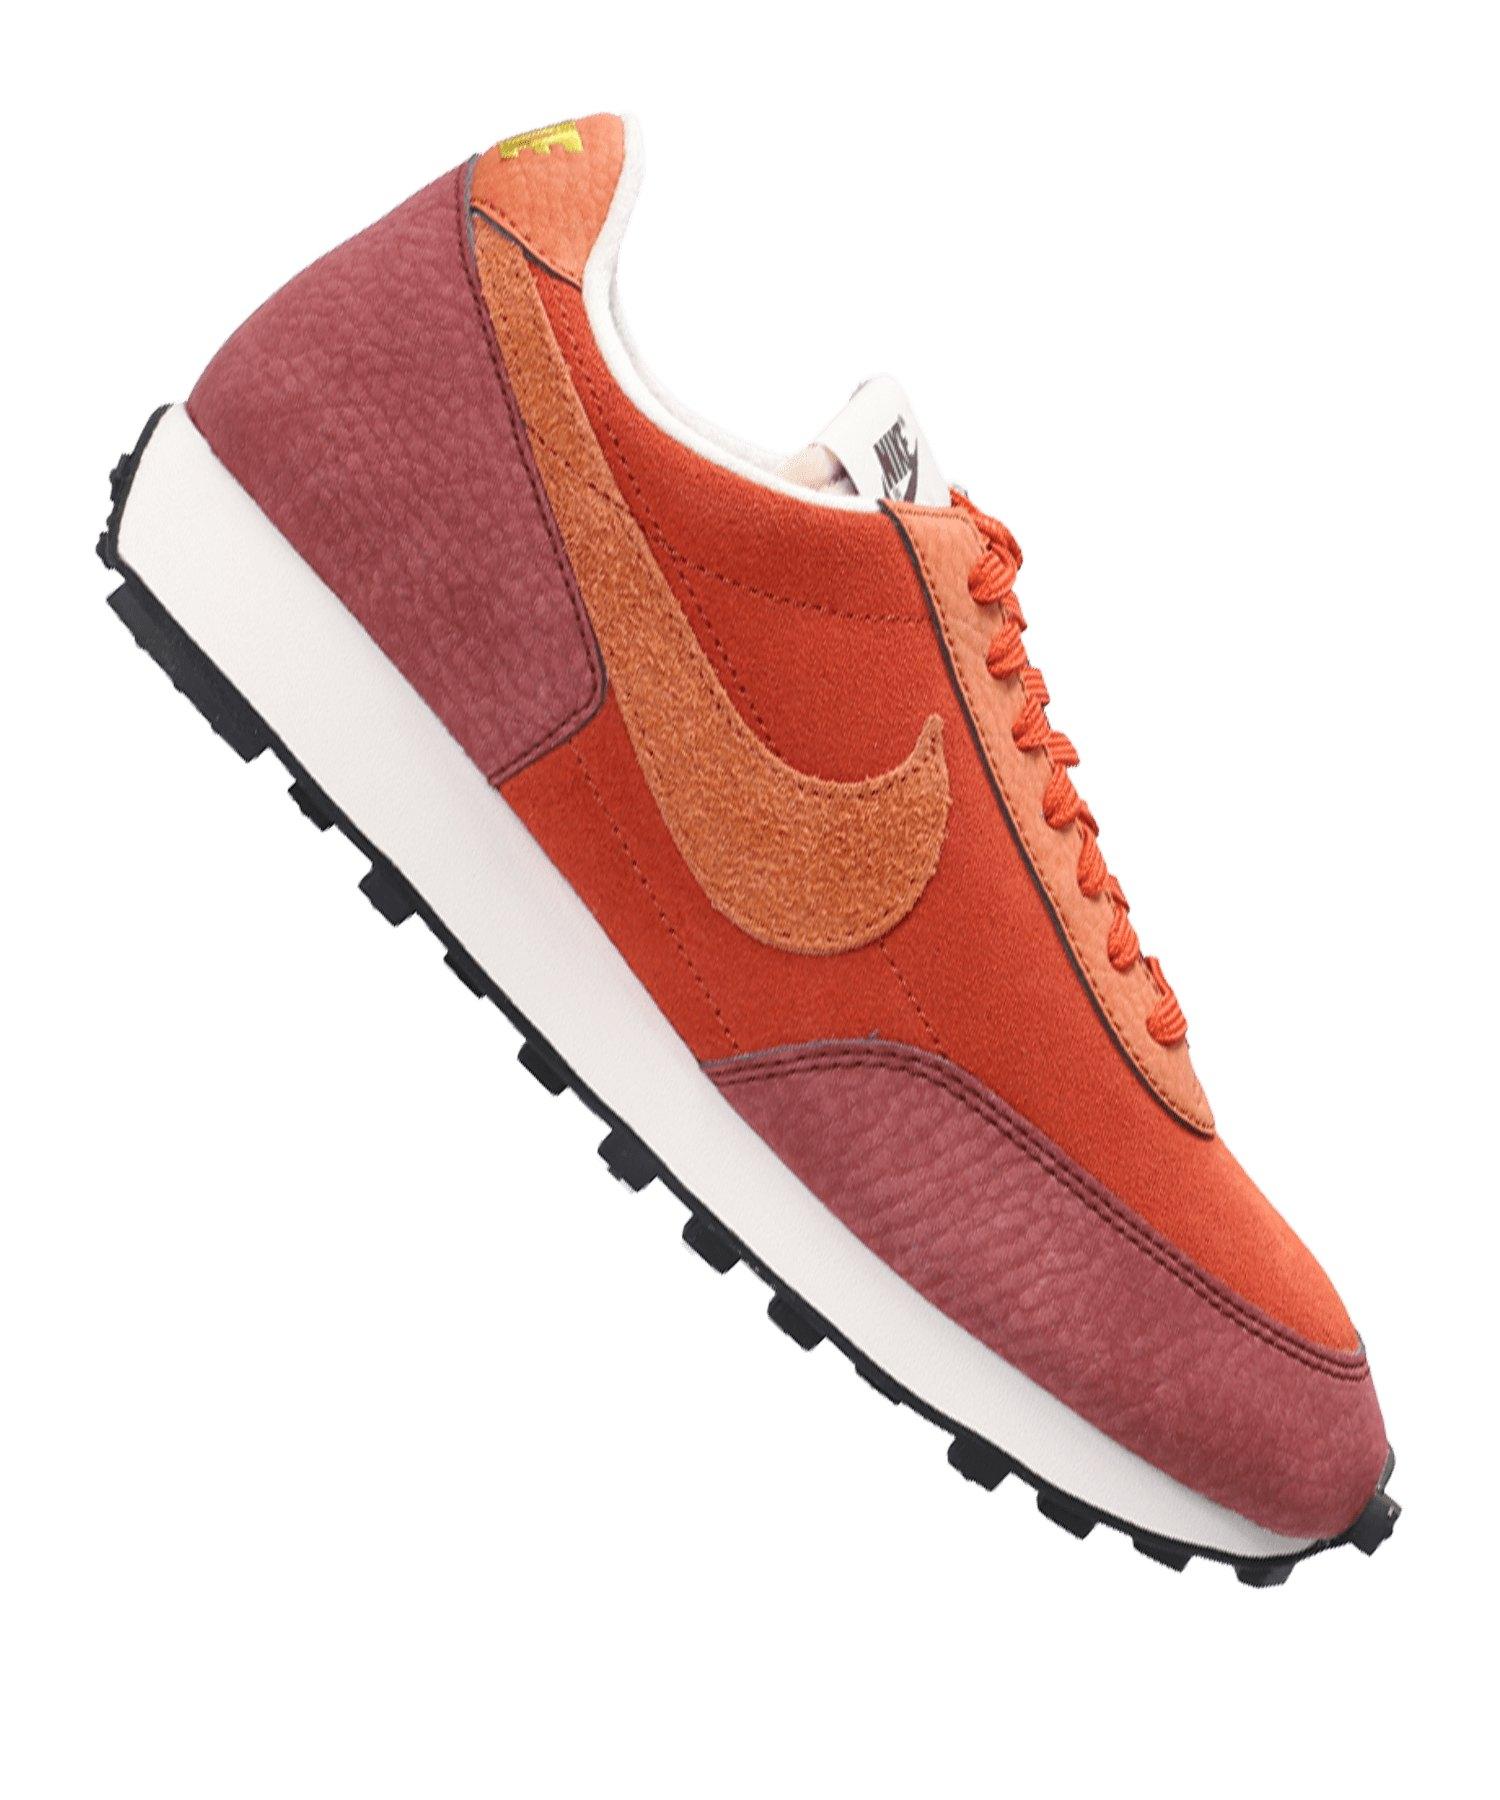 nike schuhe damen sneaker orange f800